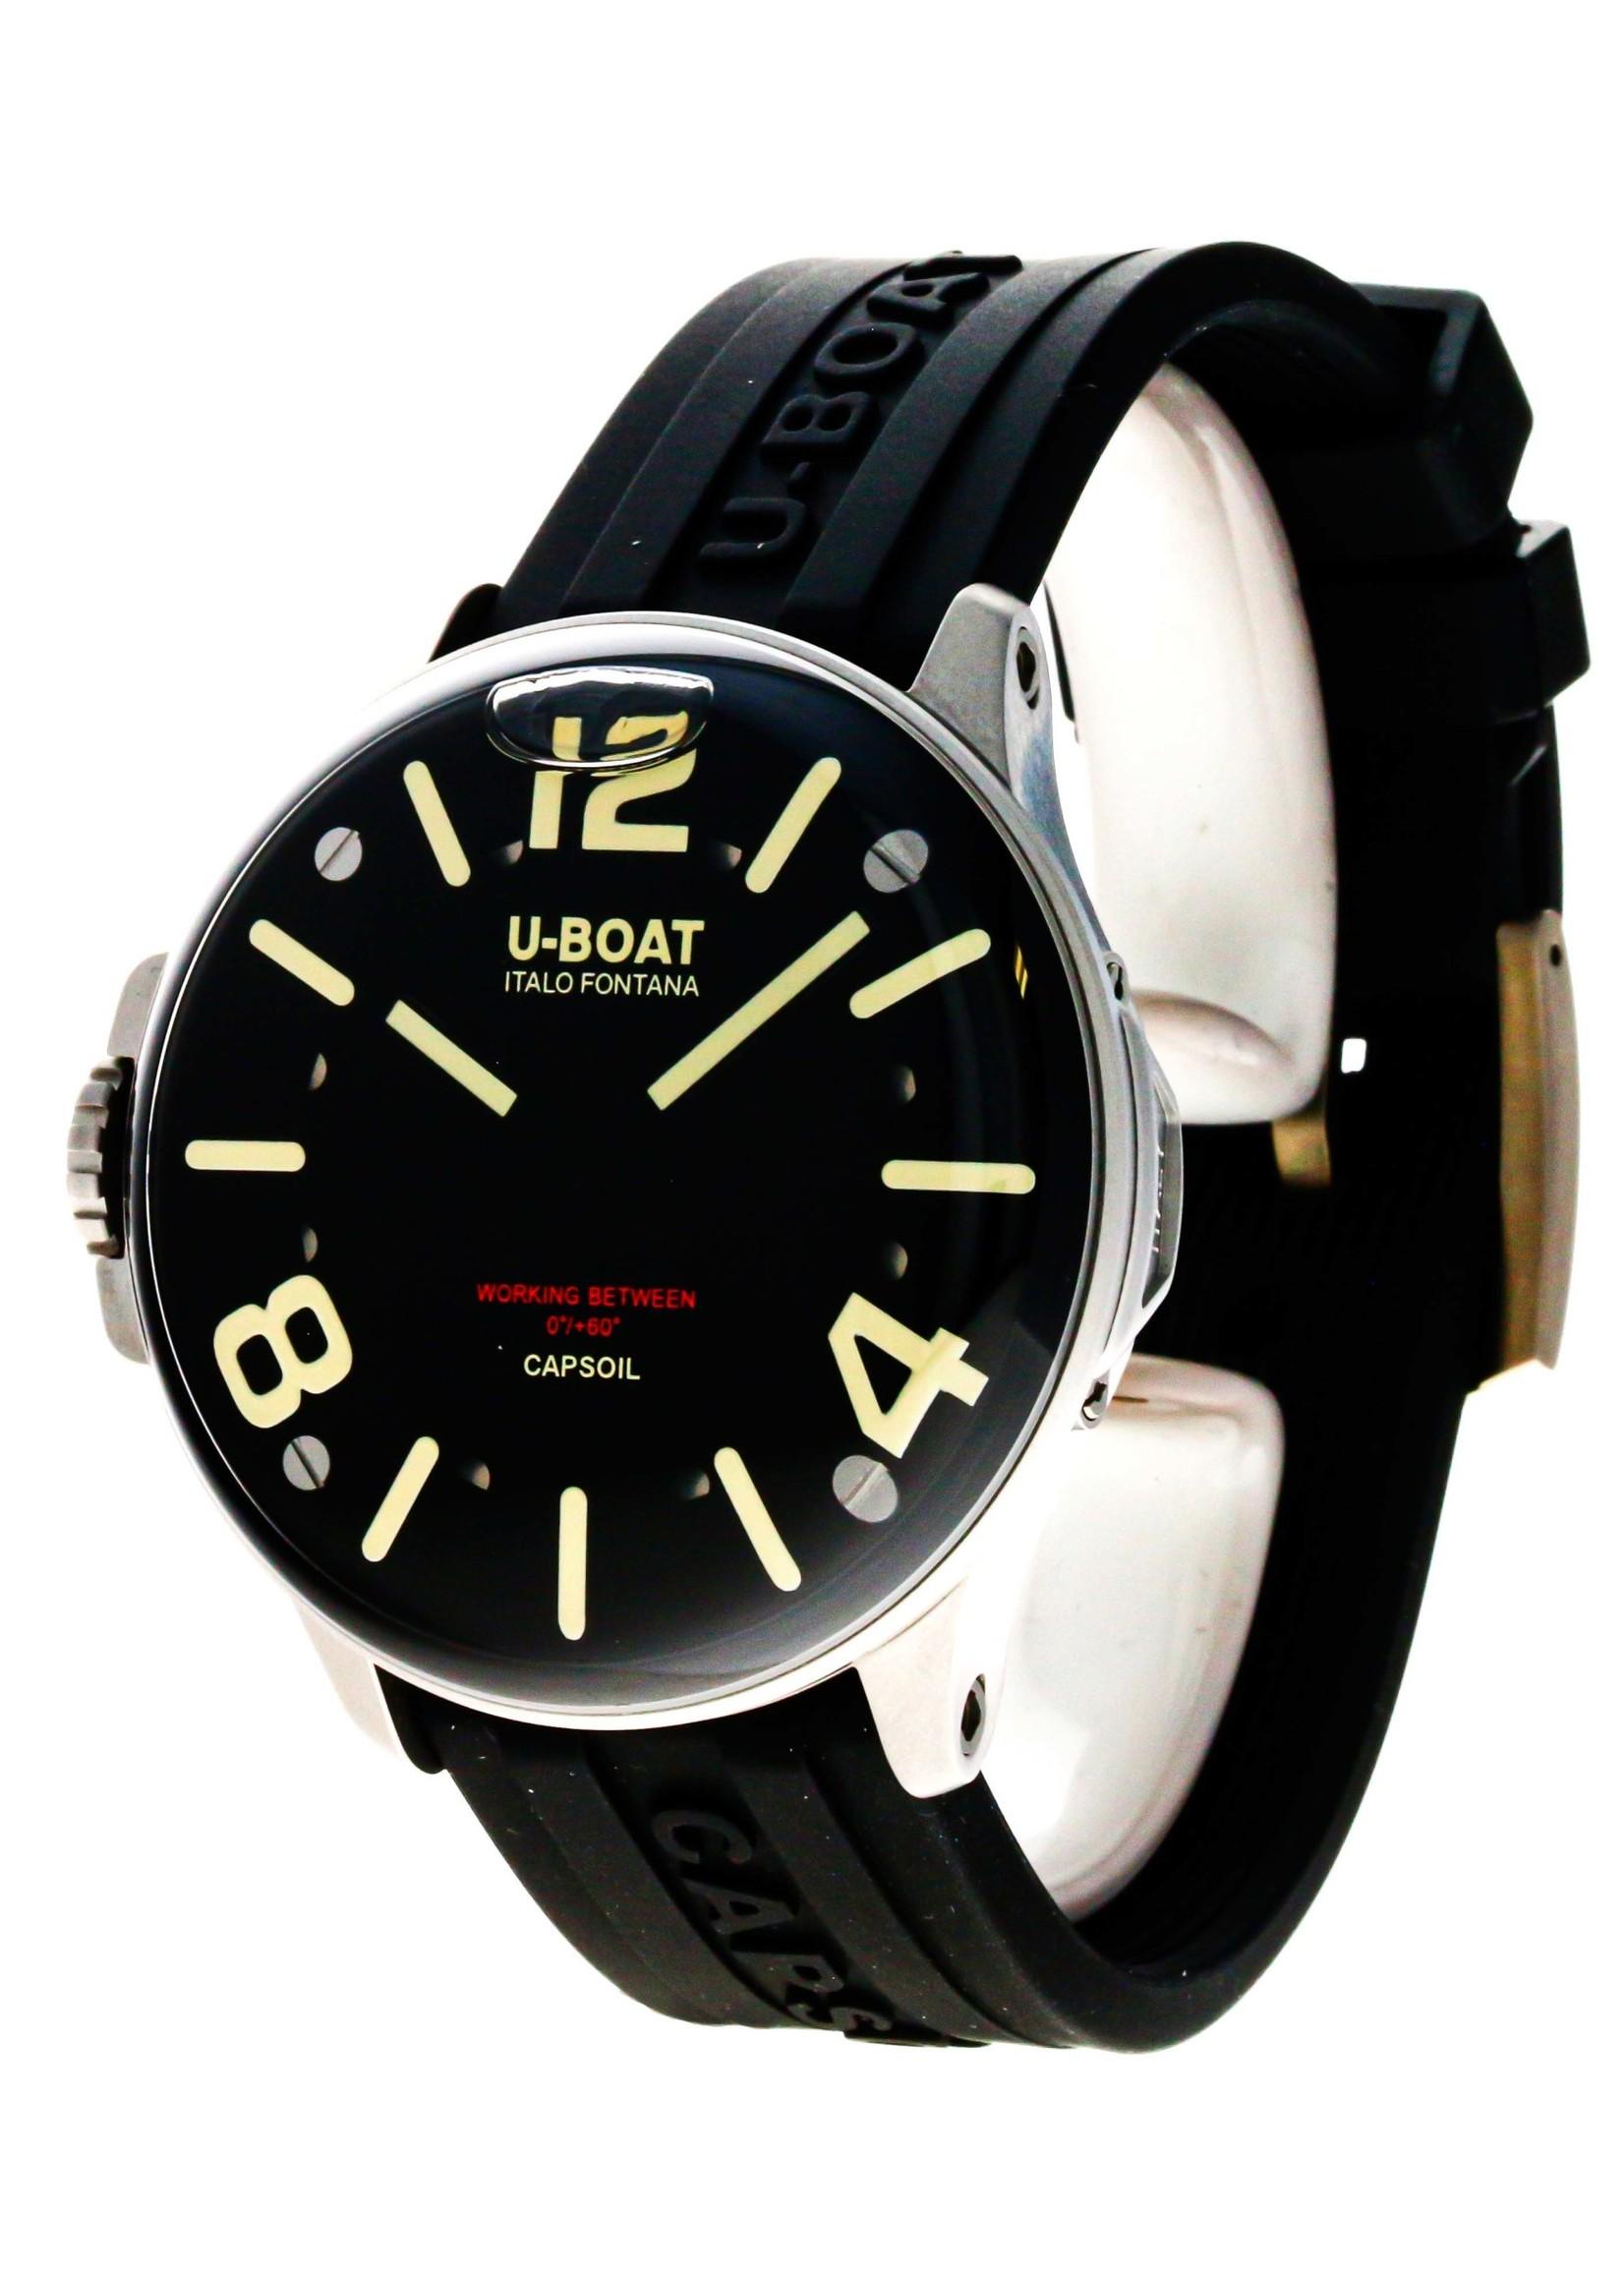 U-BOAT U-BOAT CAPSOIL #8110/A (2020 B+P)